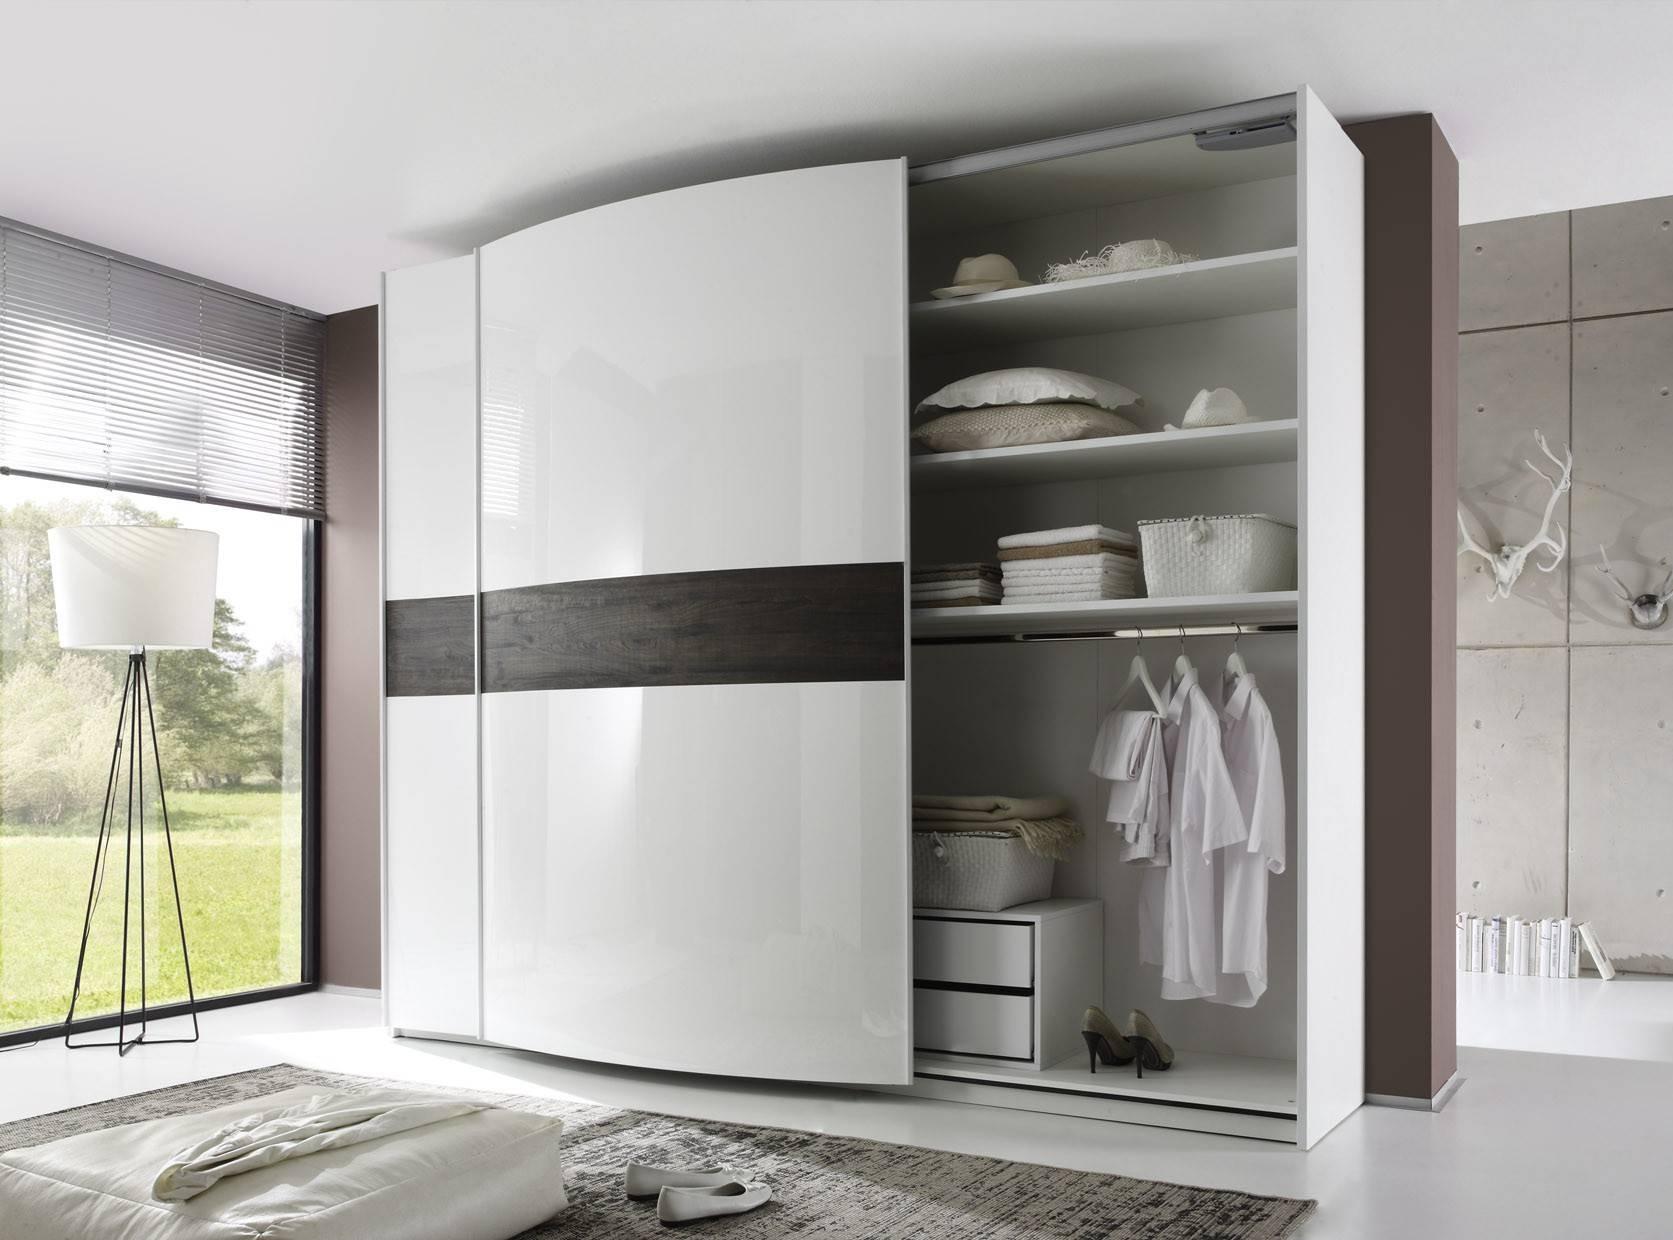 Tambura Curved Sliding Doors Wardrobe, White + Wenge Buy Online At pertaining to Curved Wardrobe Doors (Image 21 of 30)